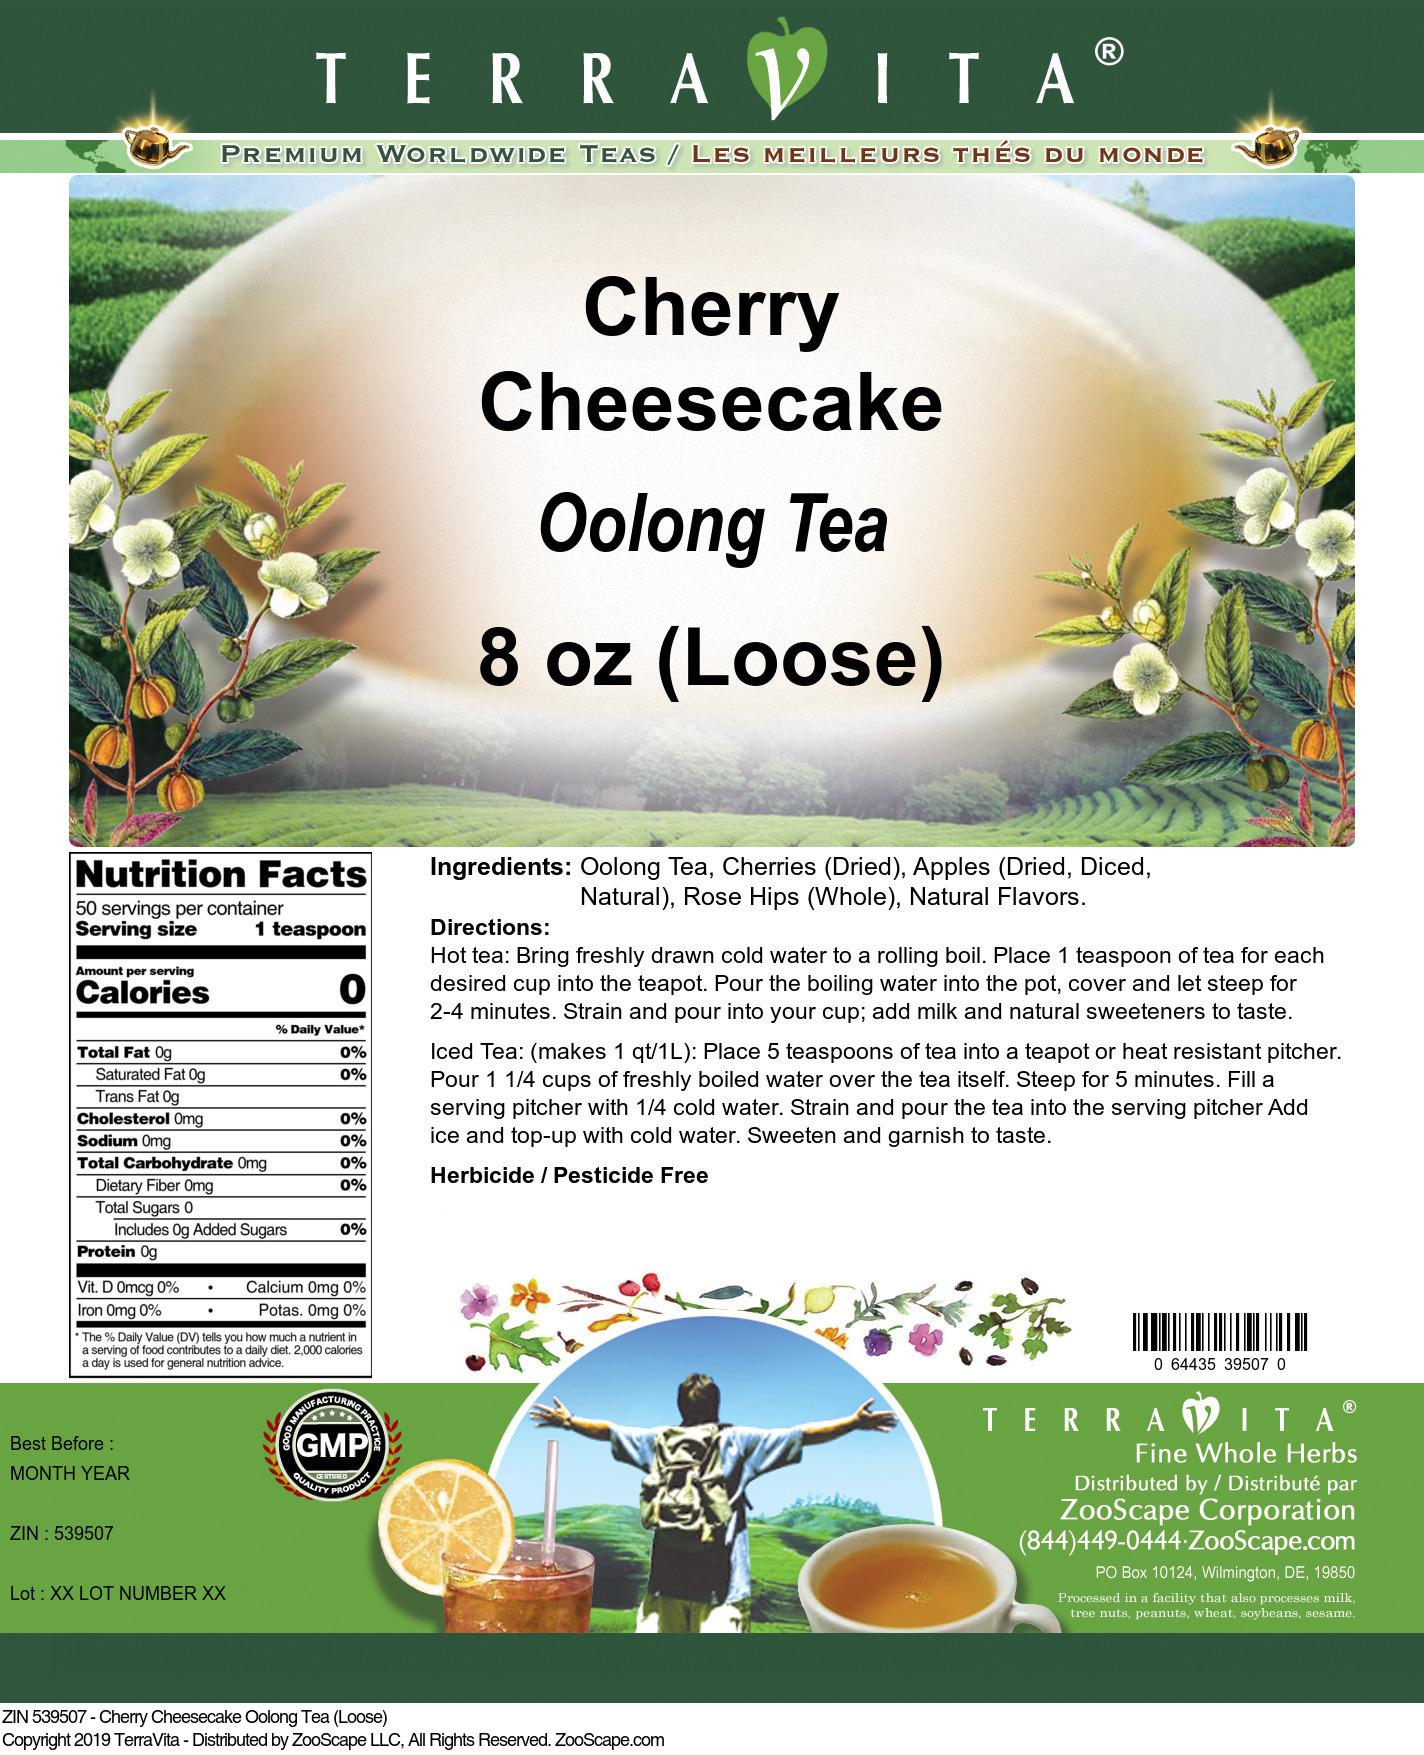 Cherry Cheesecake Oolong Tea